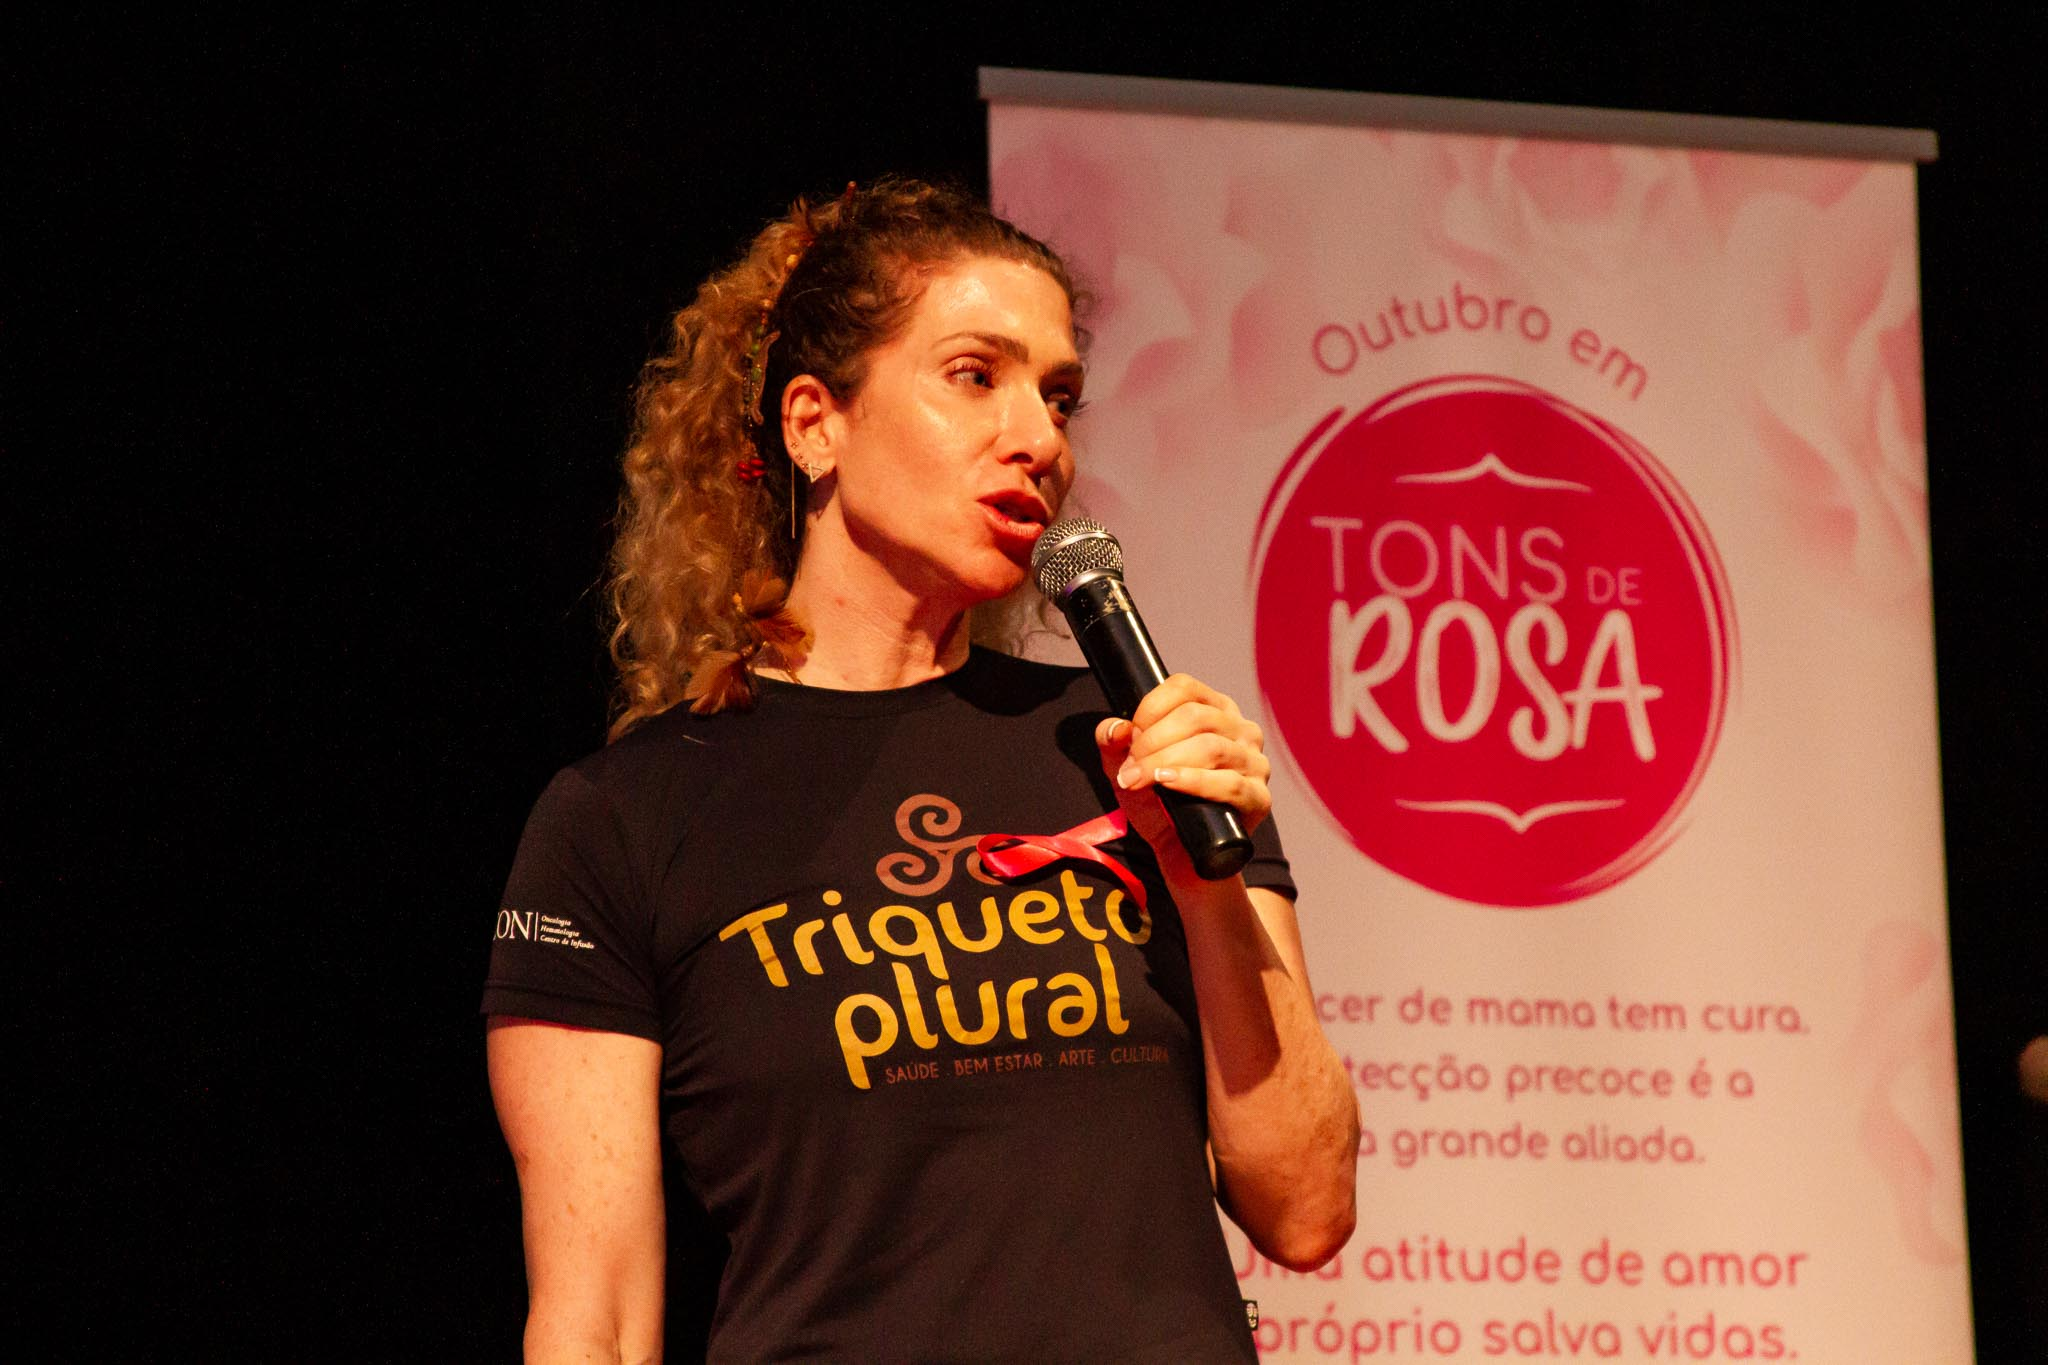 Paula-Tenenbaum-Triqueto-Plural-IMG_1944